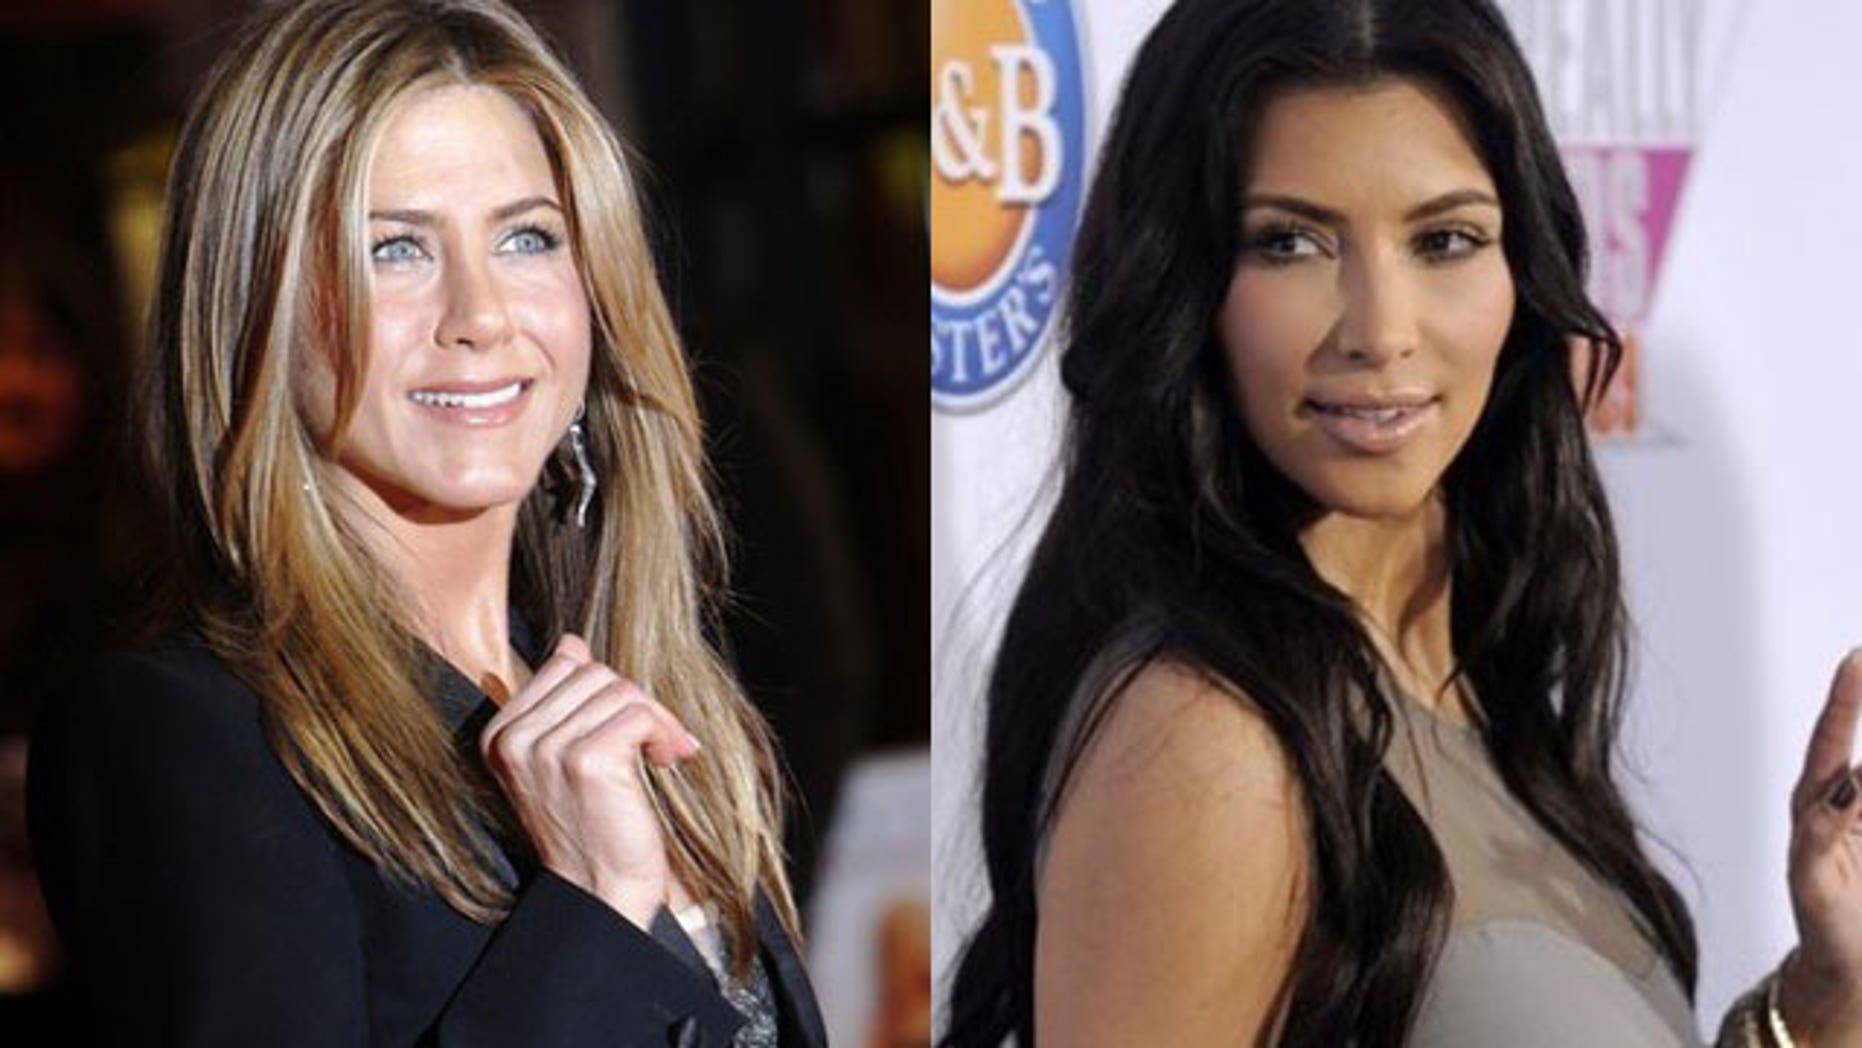 Jennifer Aniston (left) and Kim Kardashian